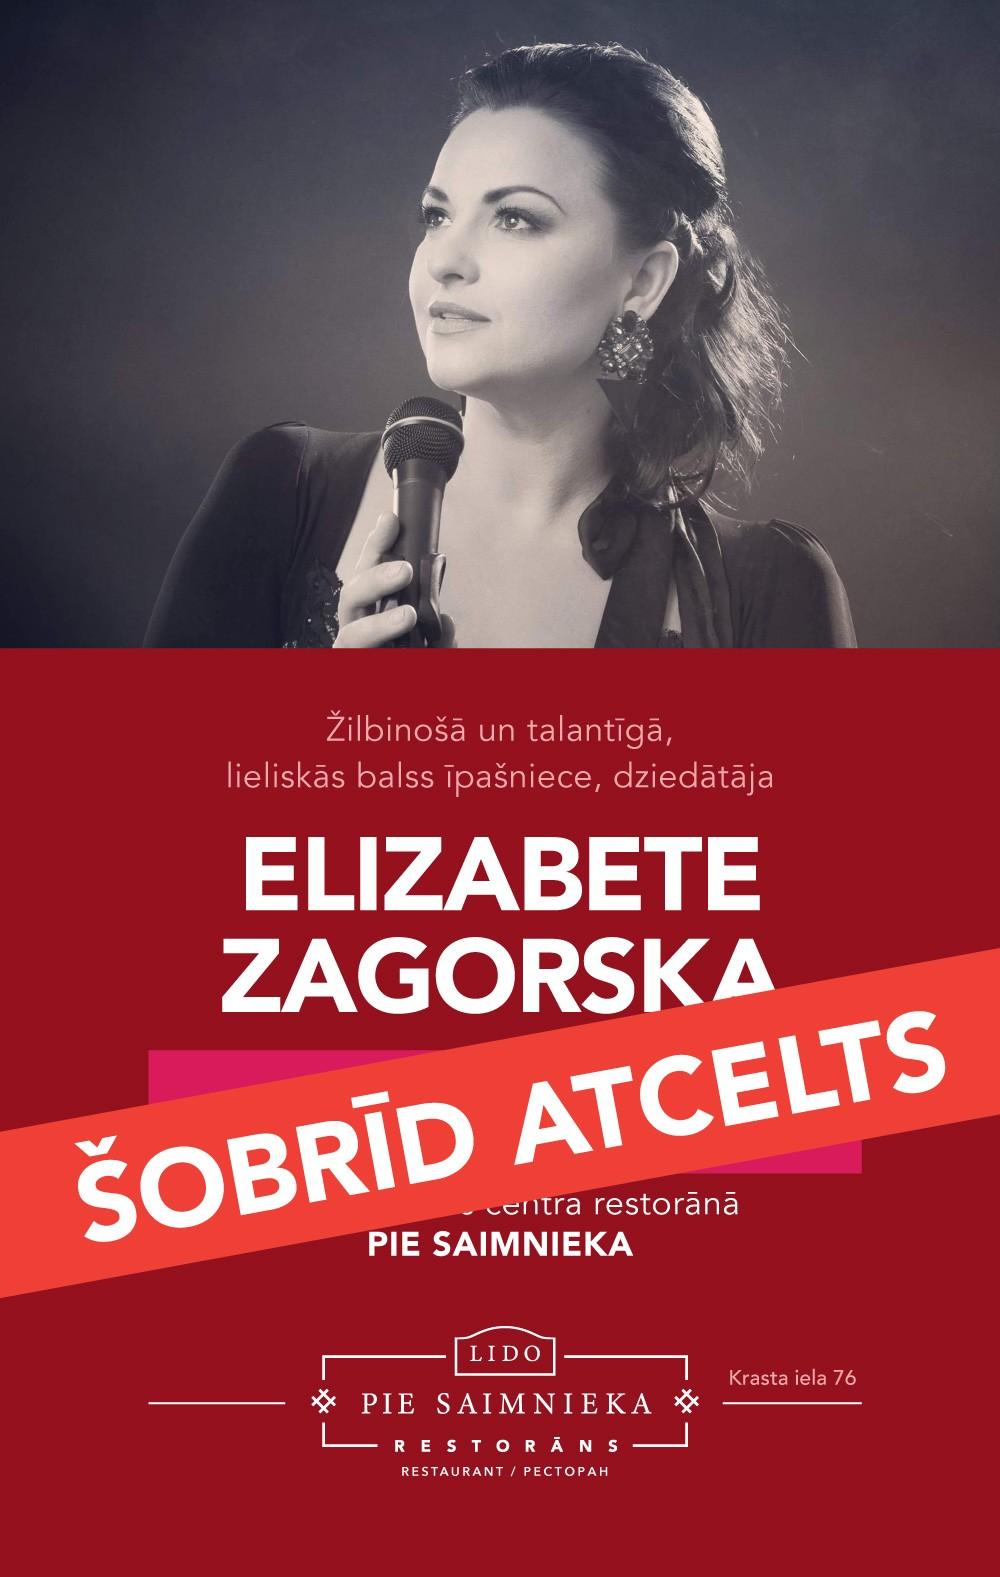 Zagorska-Piektdienas-WEBAM-11.2020-ATCELTS.jpg